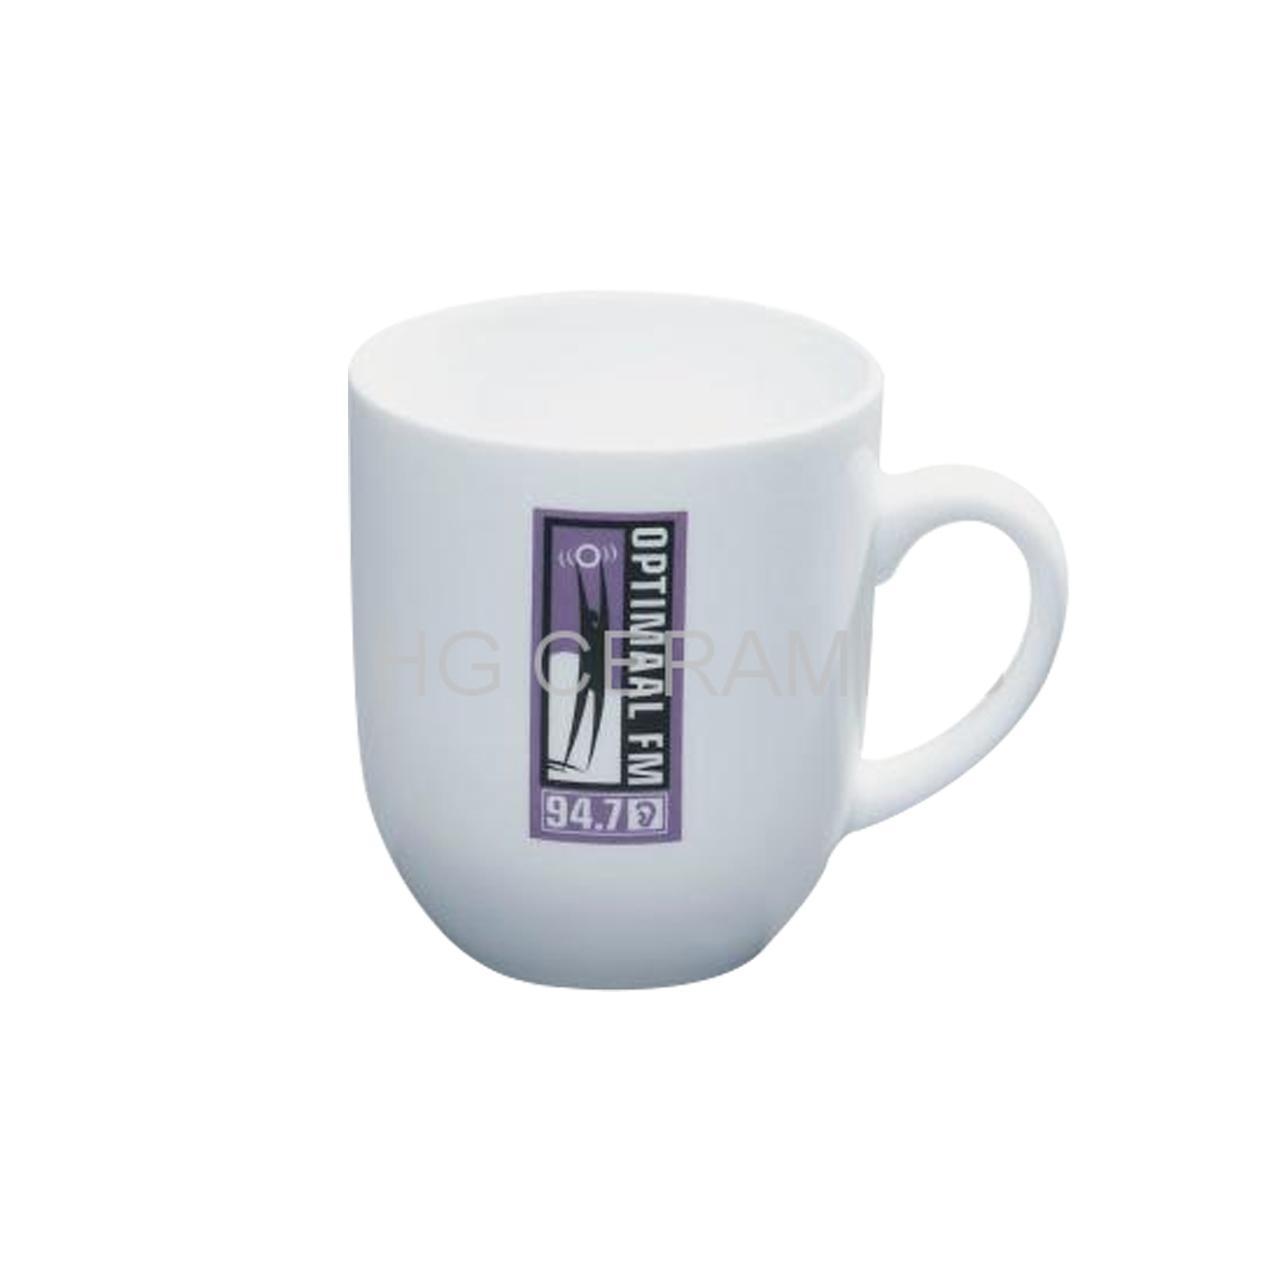 snow white porcelain mug 1